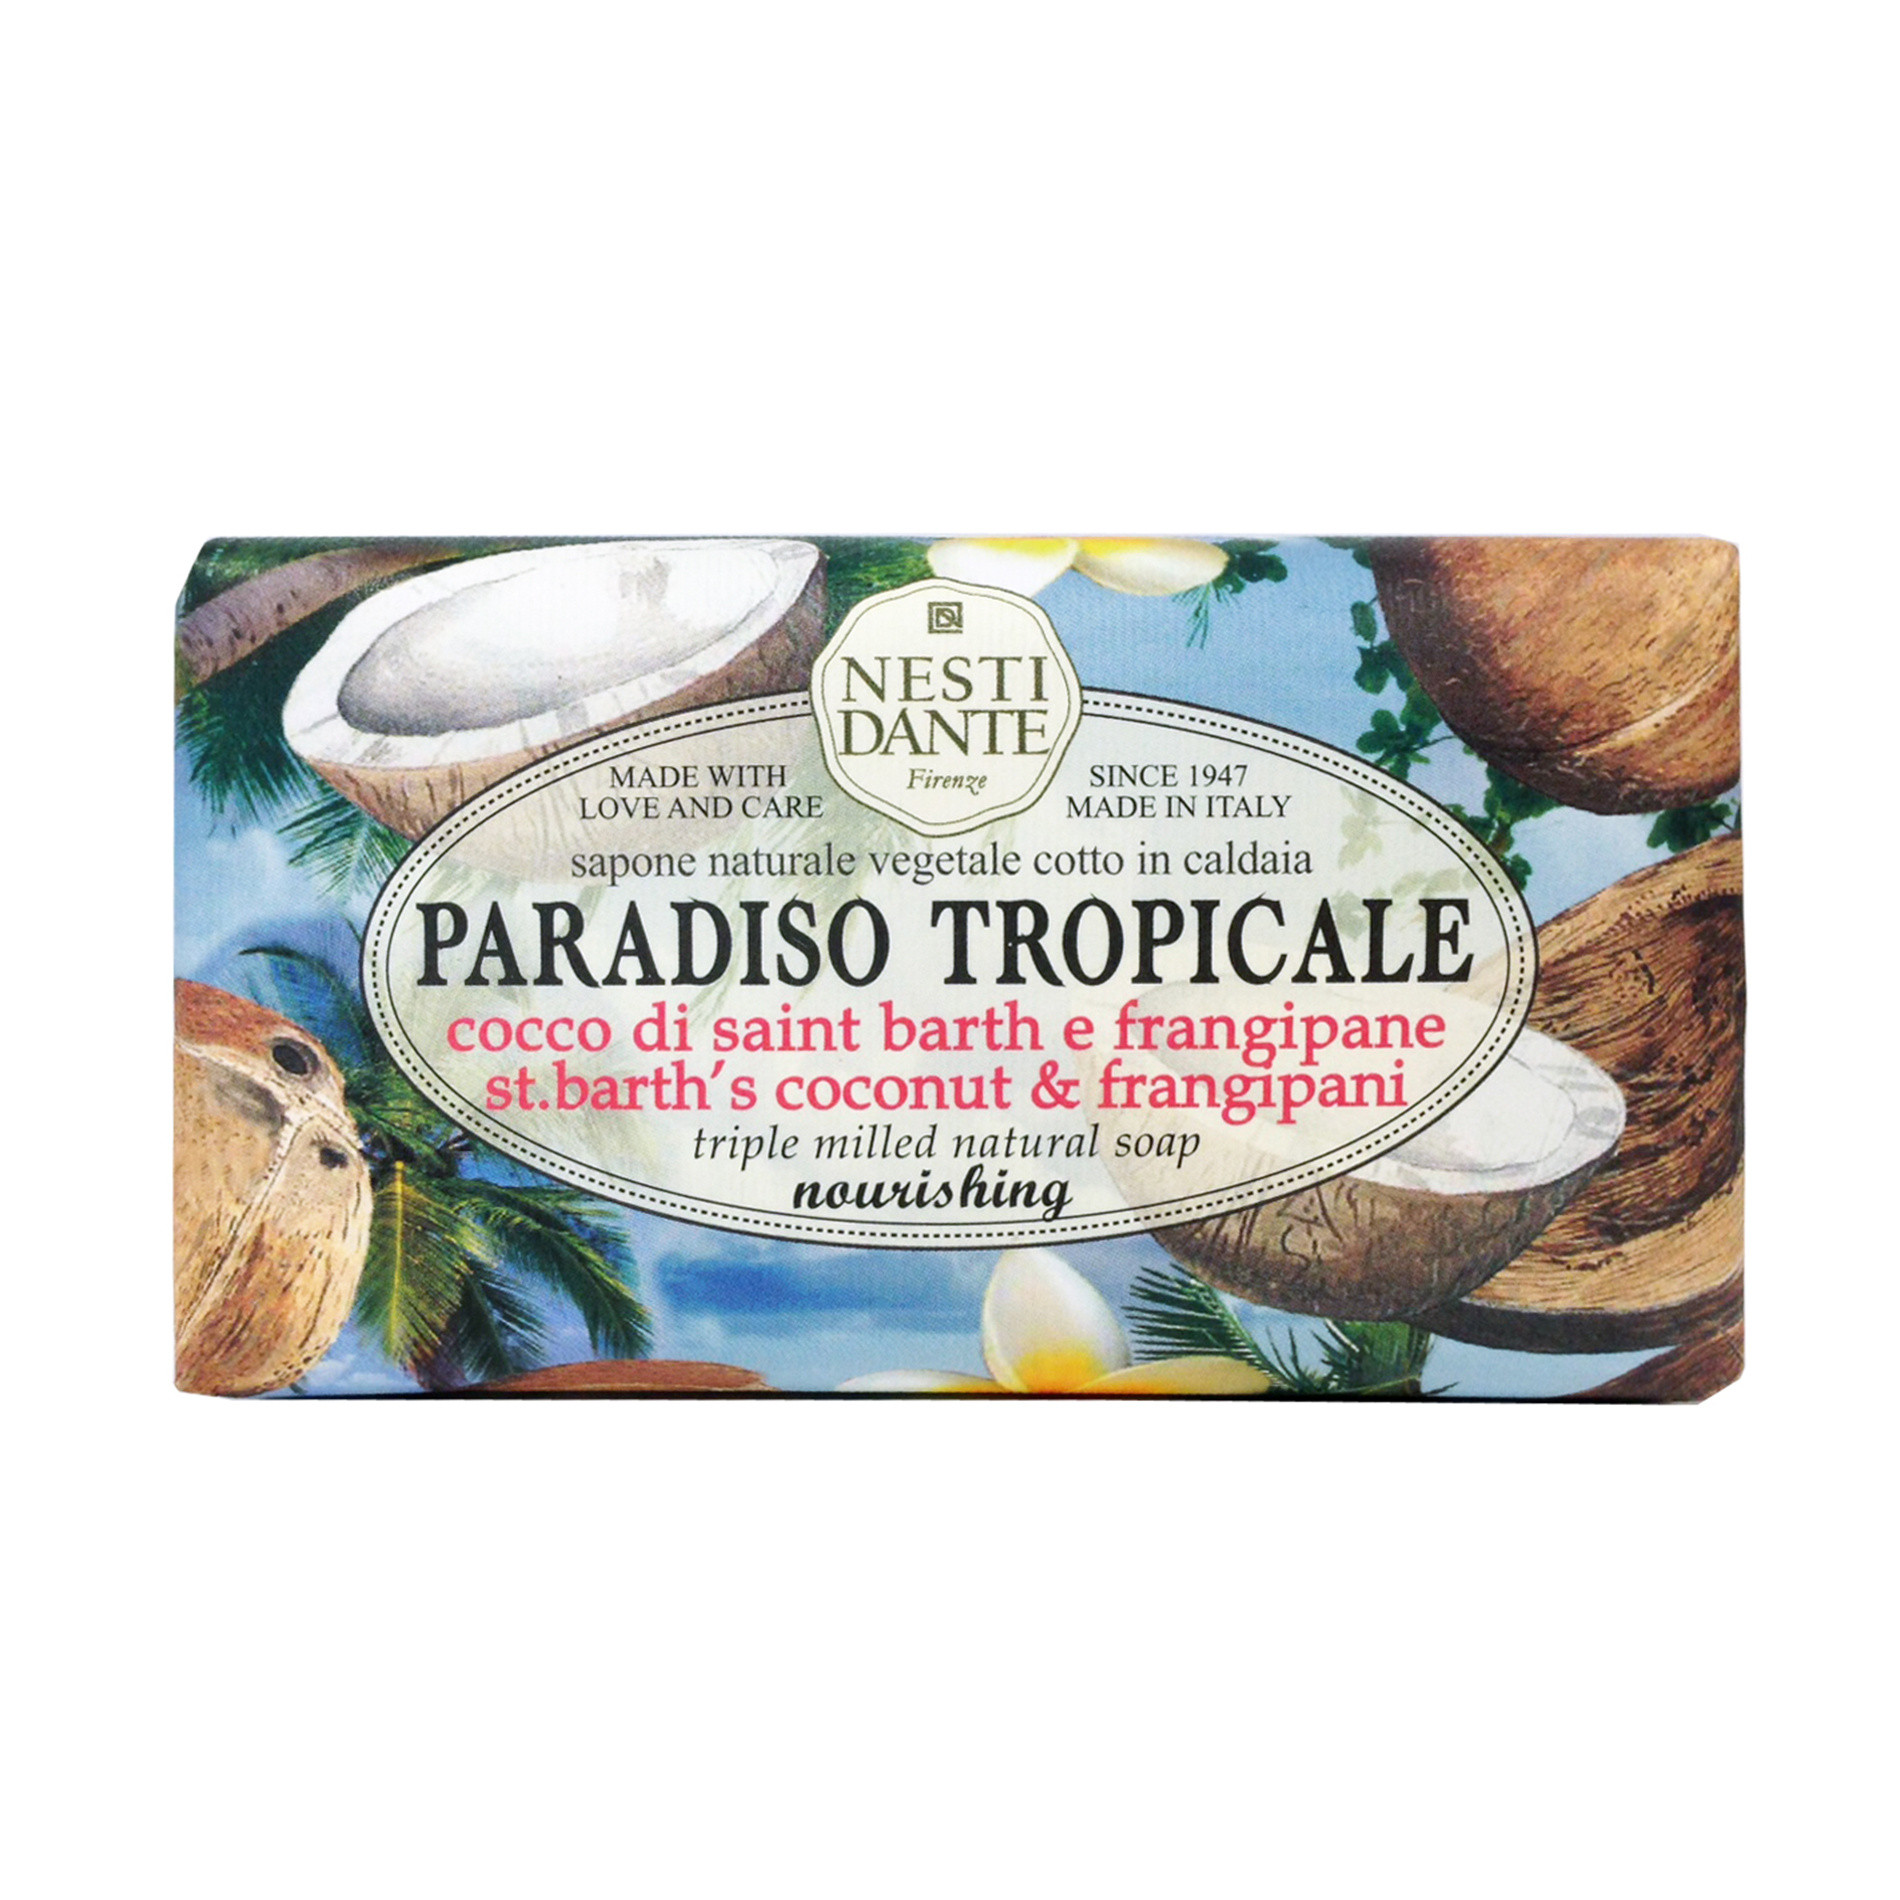 Paradiso Tropicale - Cocco Di St. Barth & Frangipane, Azzurro, large image number 0